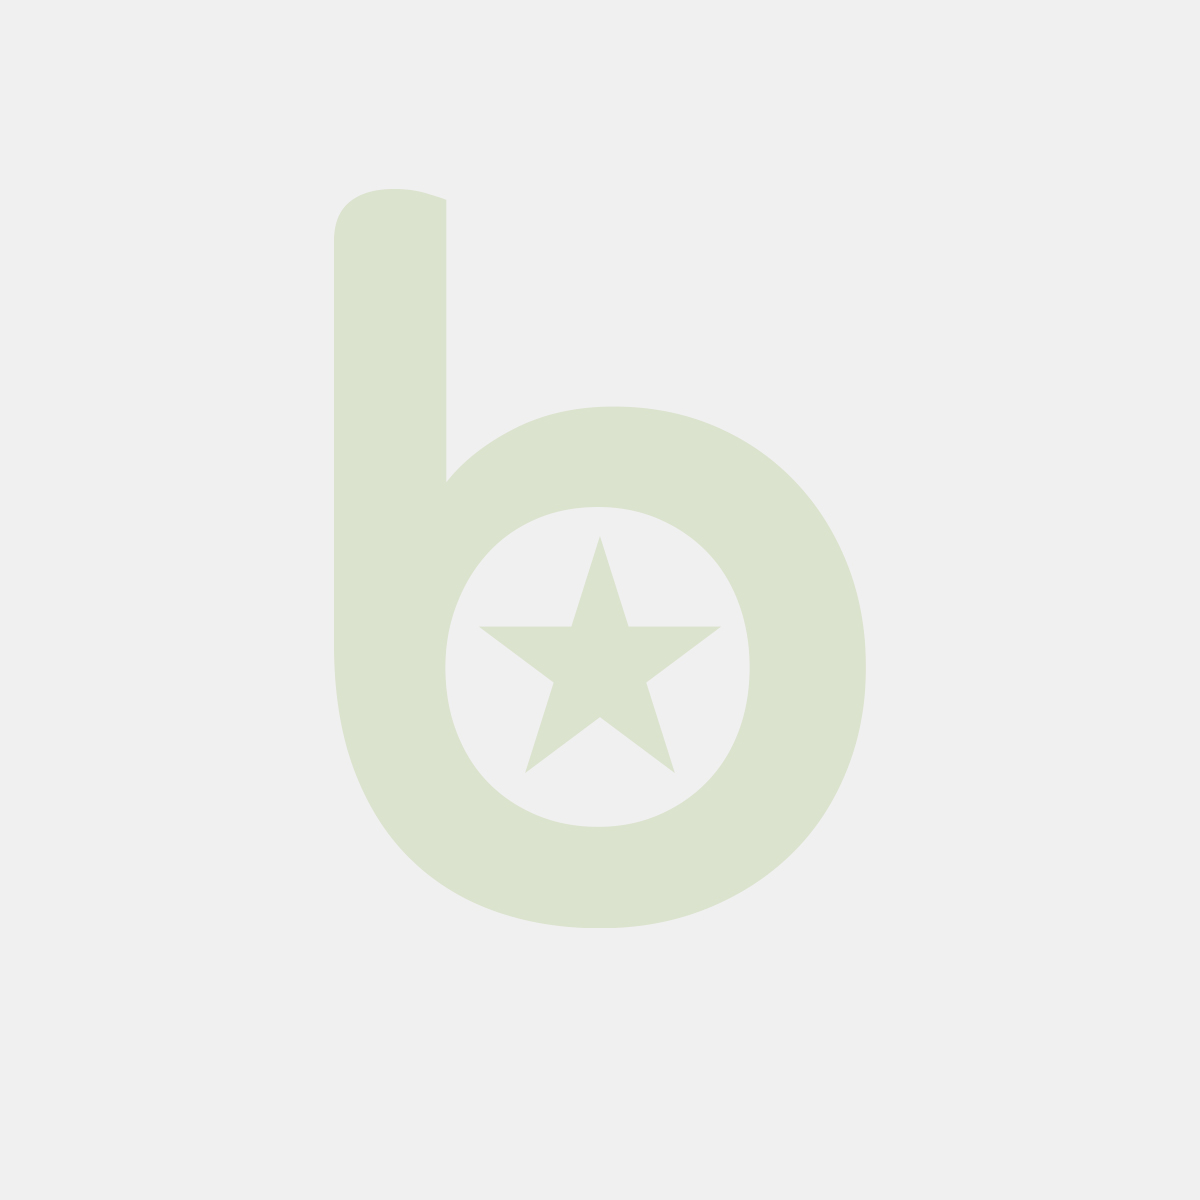 FINGERFOOD - pucharek PS 90ml biały 7,2x7,2cm op. 25 sztuk